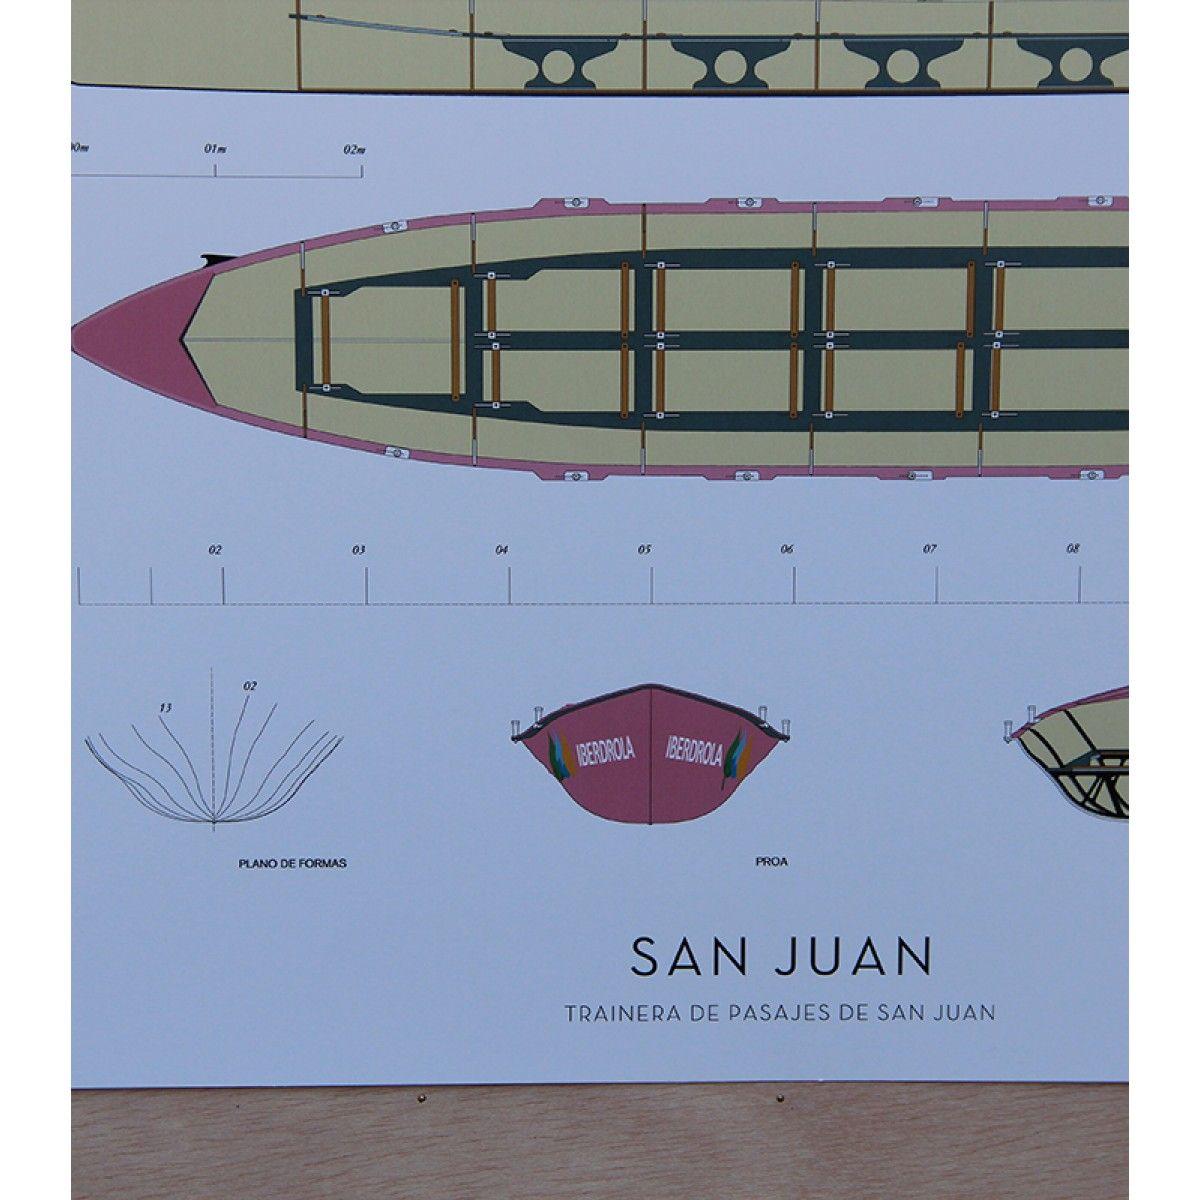 San juan trainera santiago noain maura poster traineras for Arquitectura naval pdf